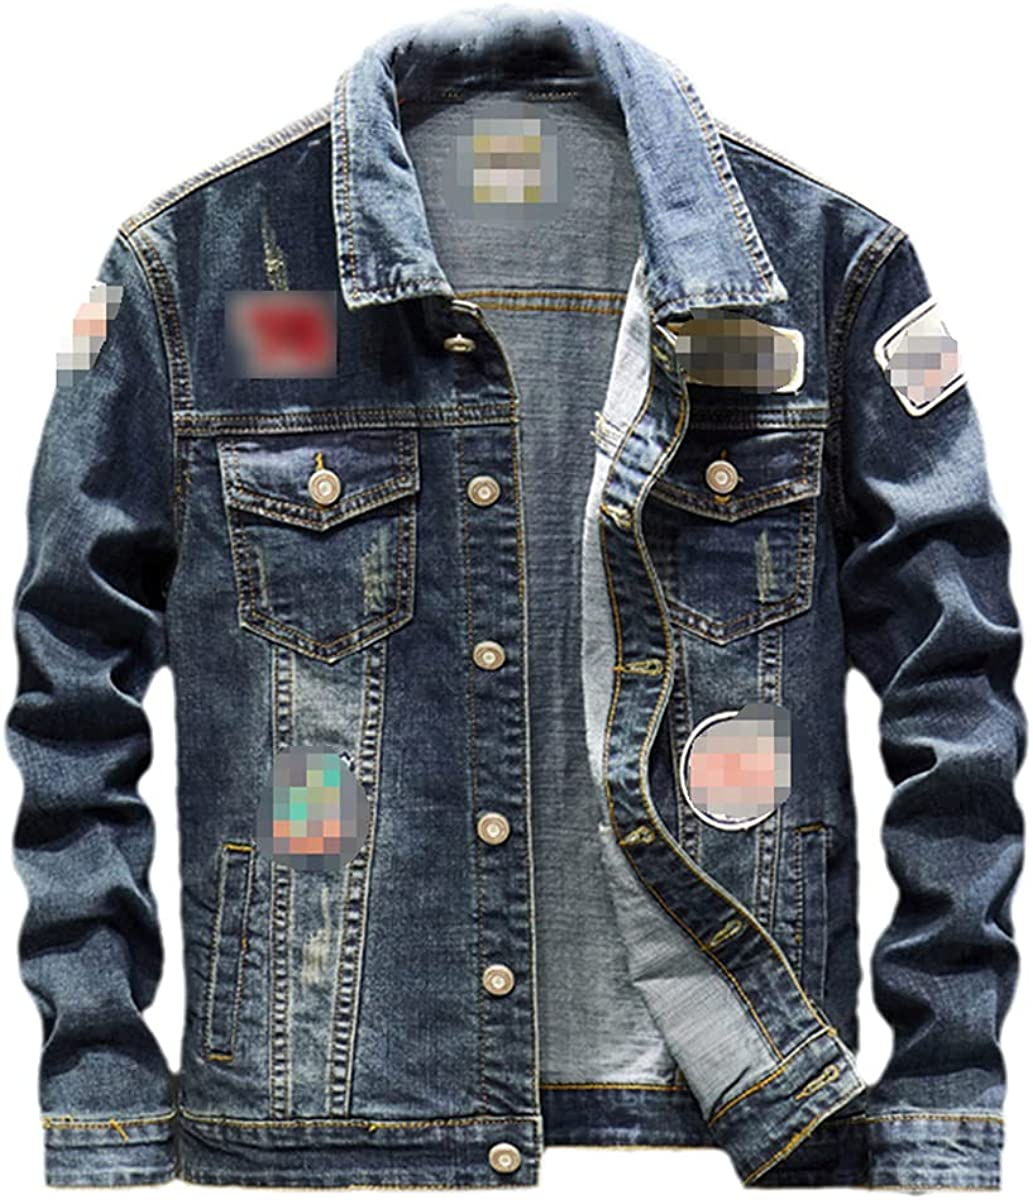 Men's Personalized Casual Denim Jacket Fashion Streetwear Spring And Autumn Denim Coat